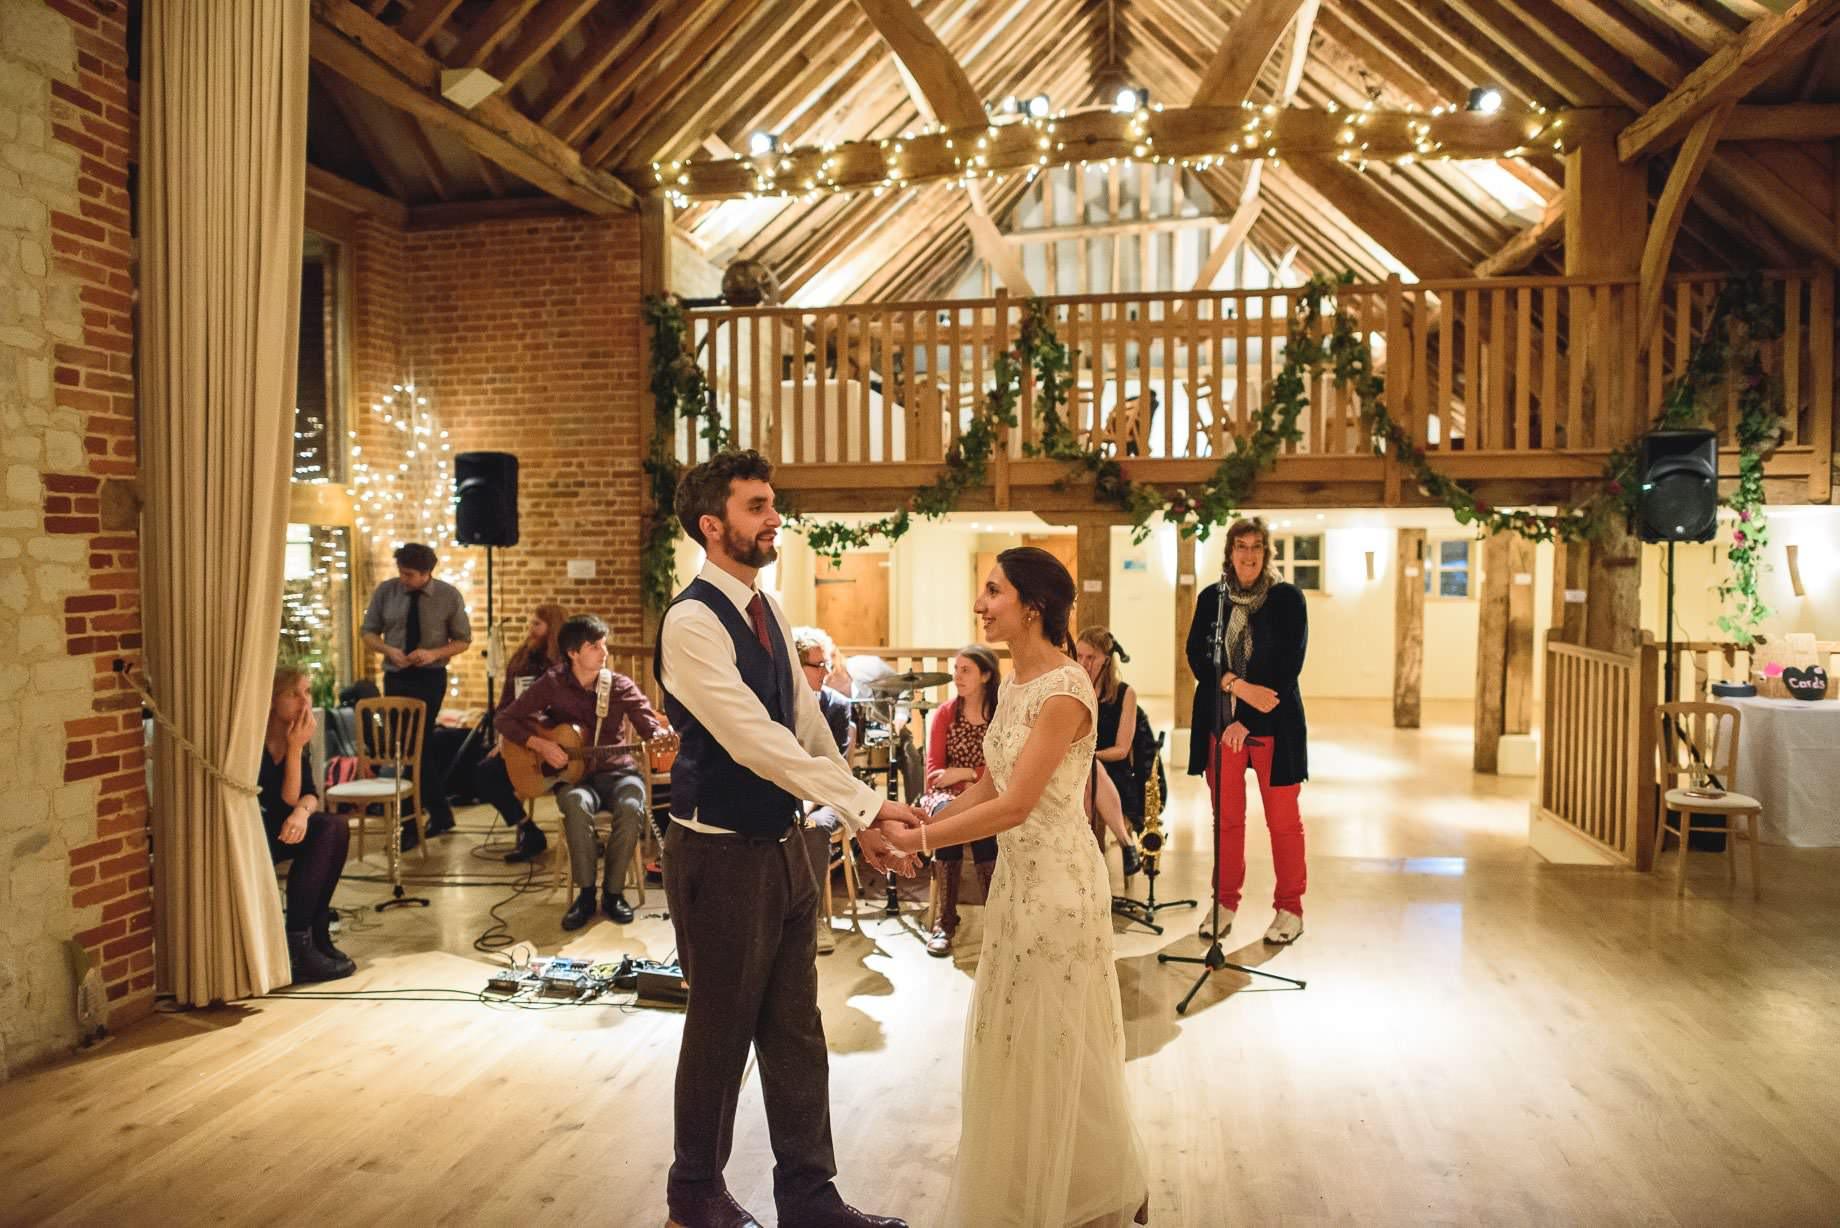 bury-court-barn-wedding-photography-guy-collier-photography-nadia-tom-171-of-184